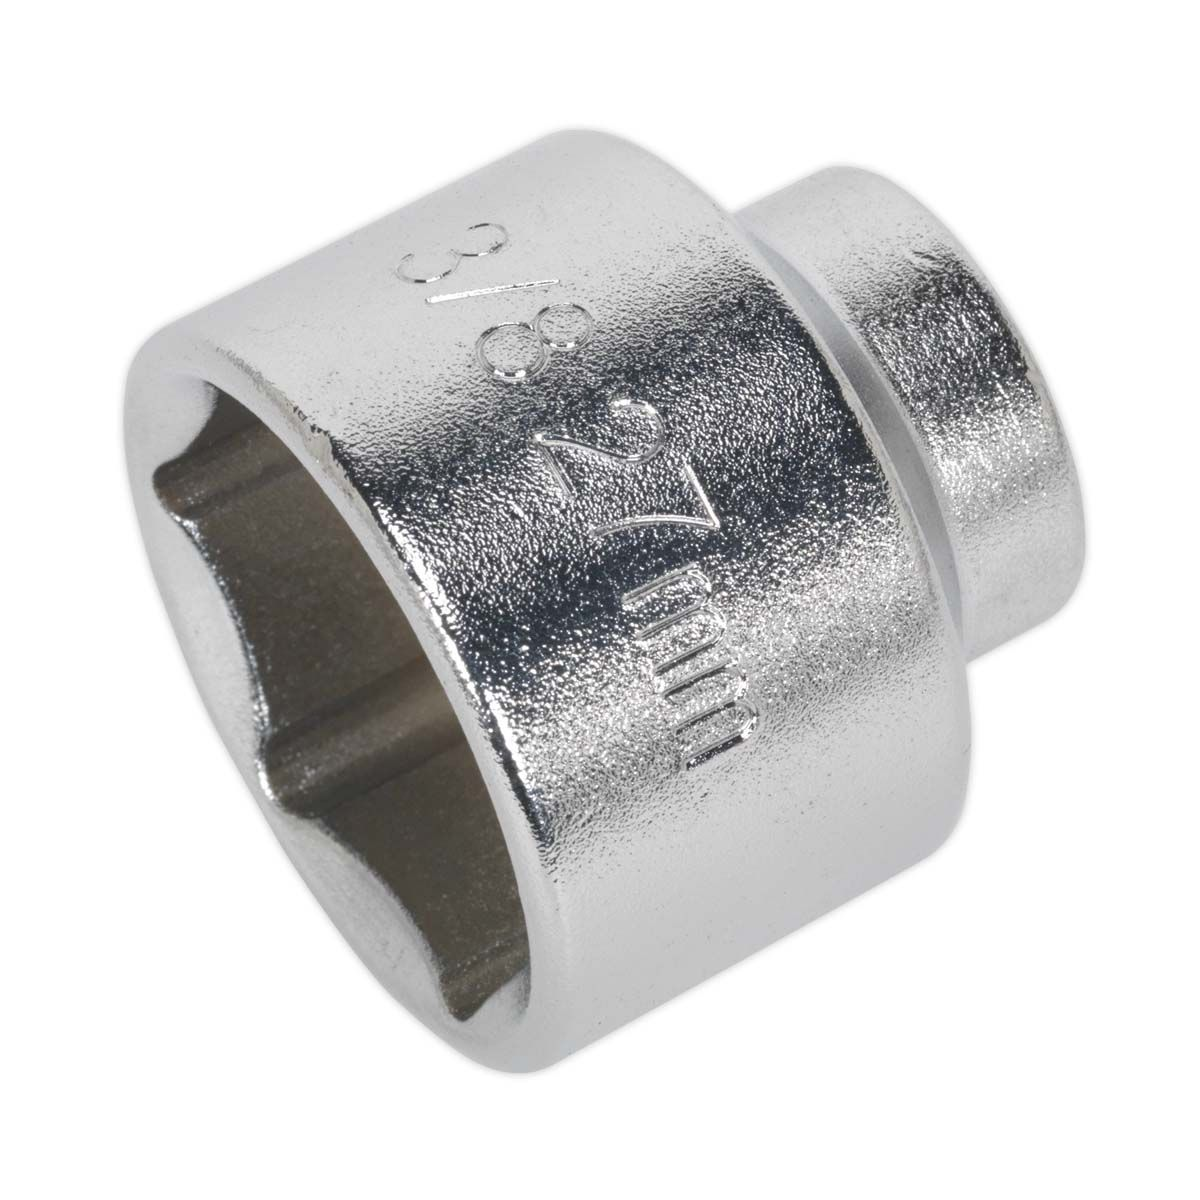 "Sealey Low Profile Oil Filter Socket 27mm 3/8""Sq Drive"